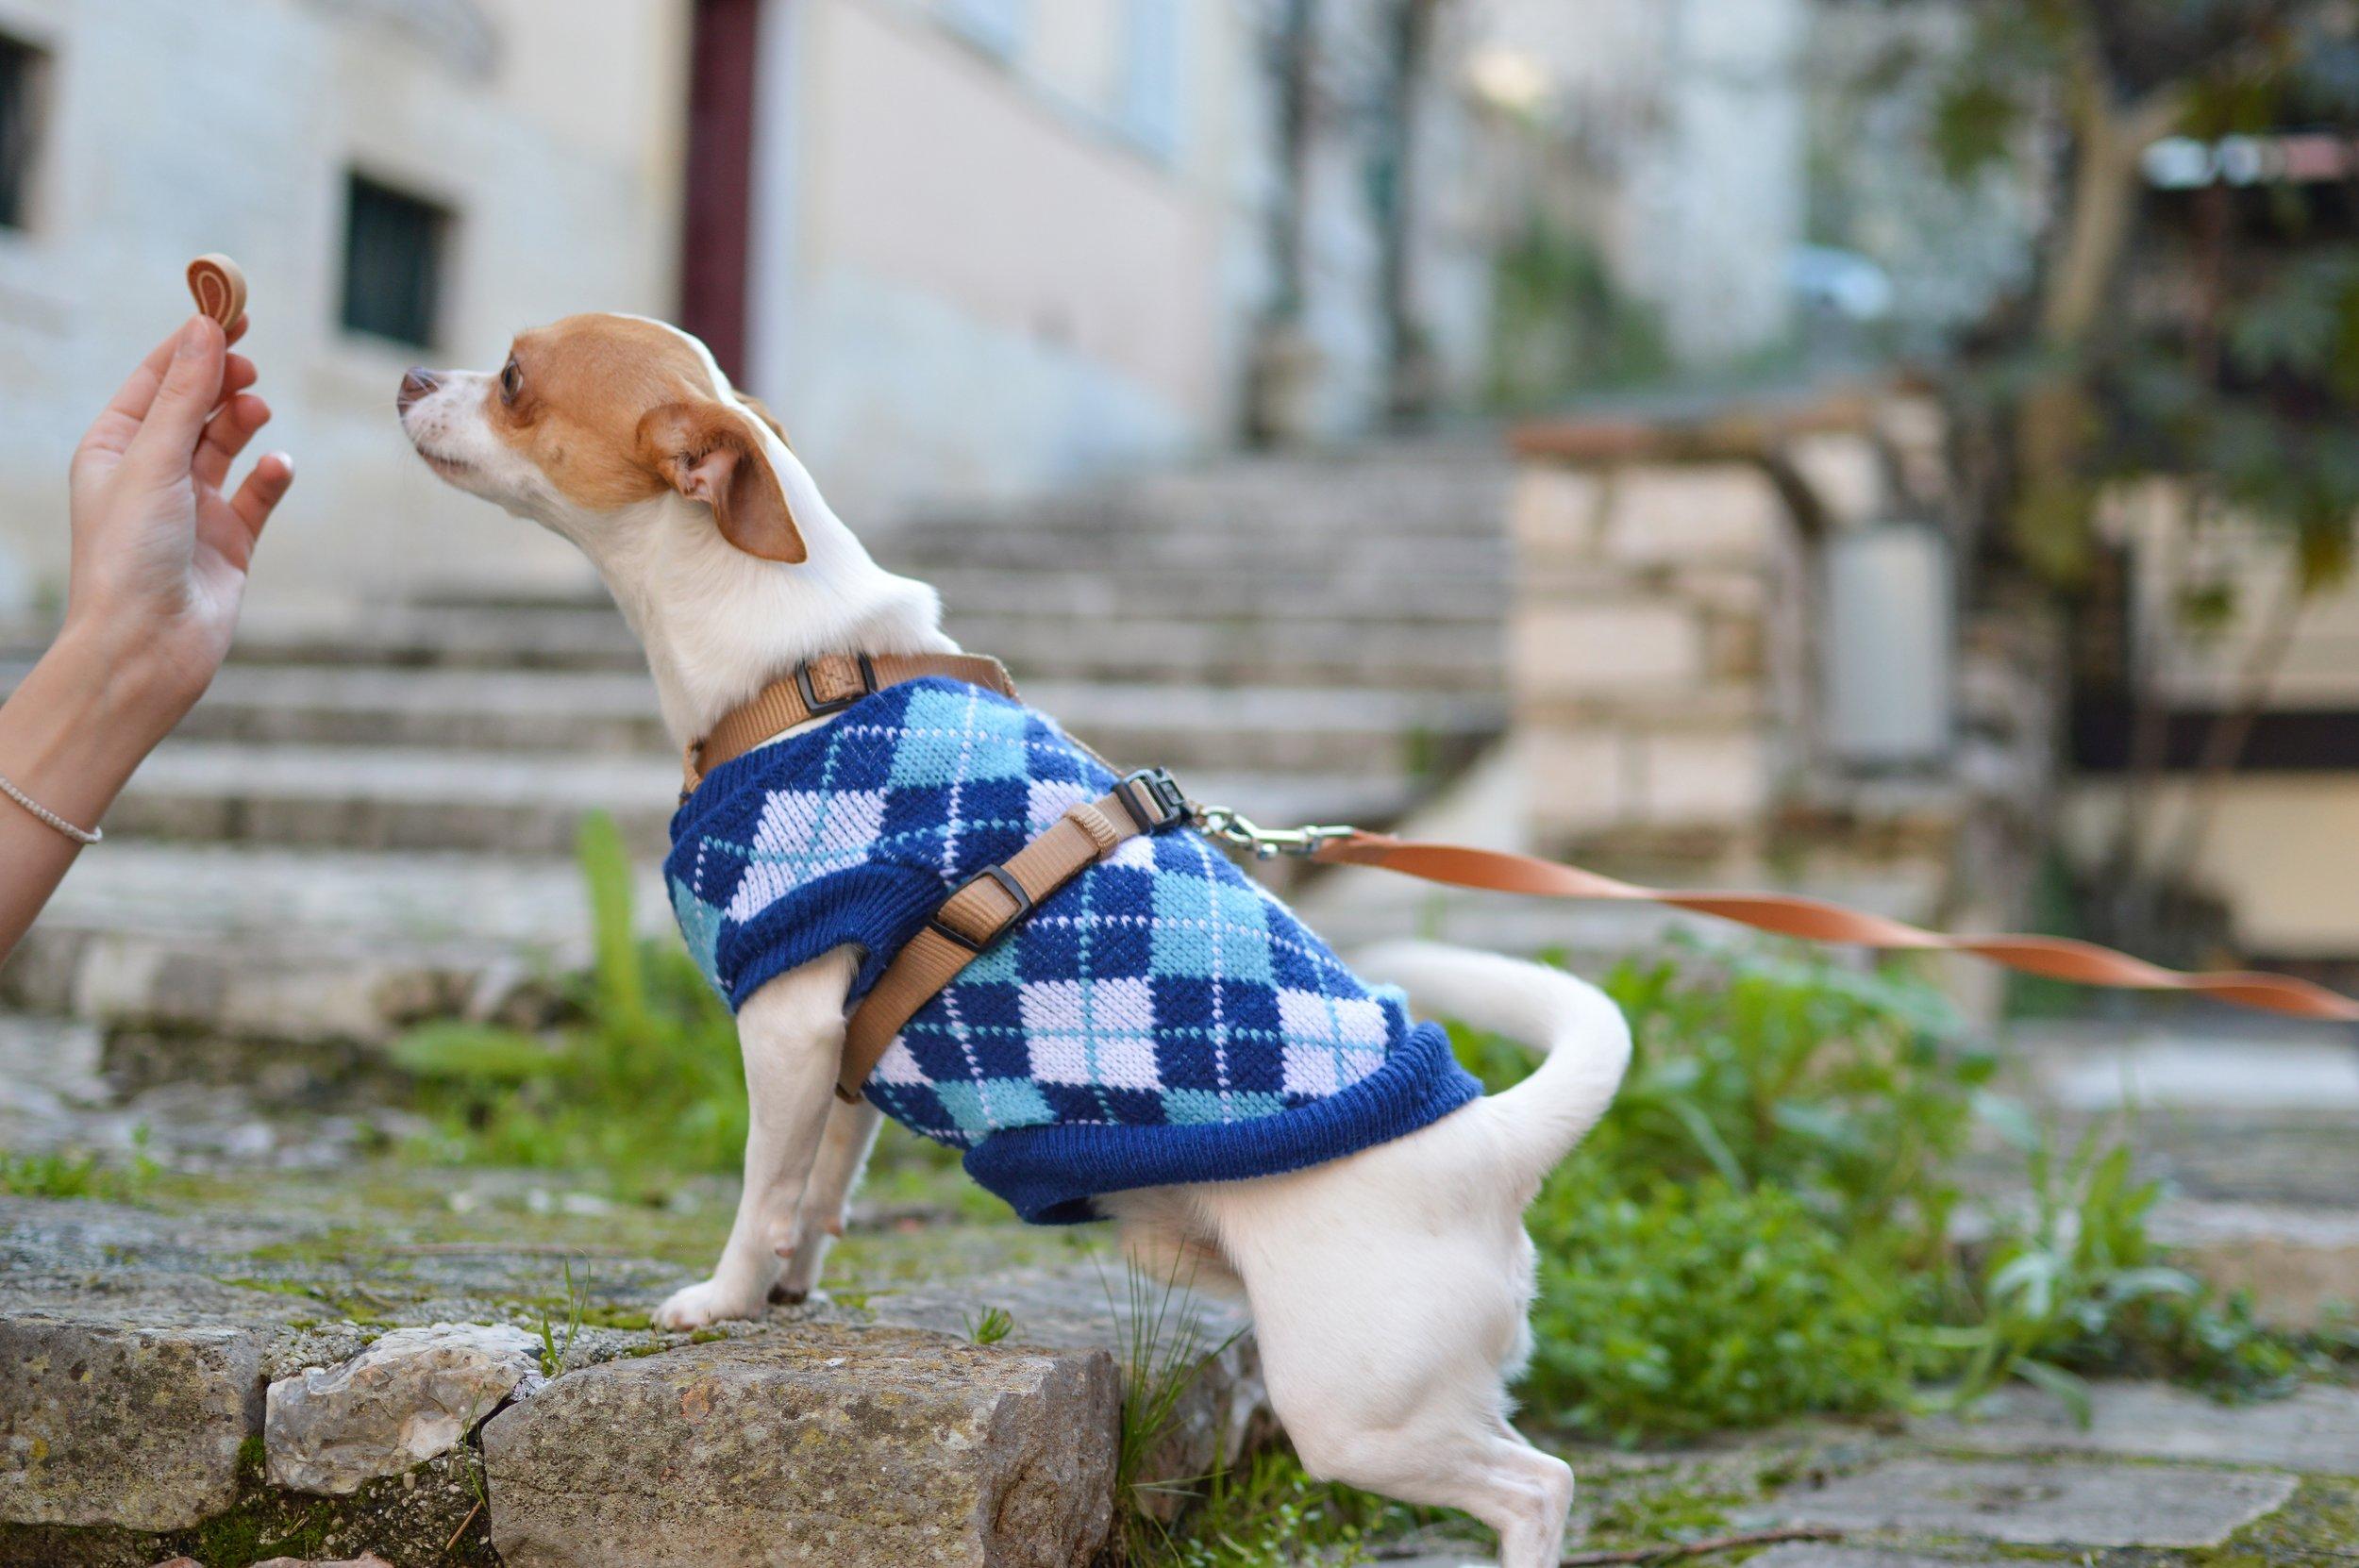 Homeward Bound Animal Care  Dog Training  Dog Treat  Impulse Control/ Self Control  Dog Walking